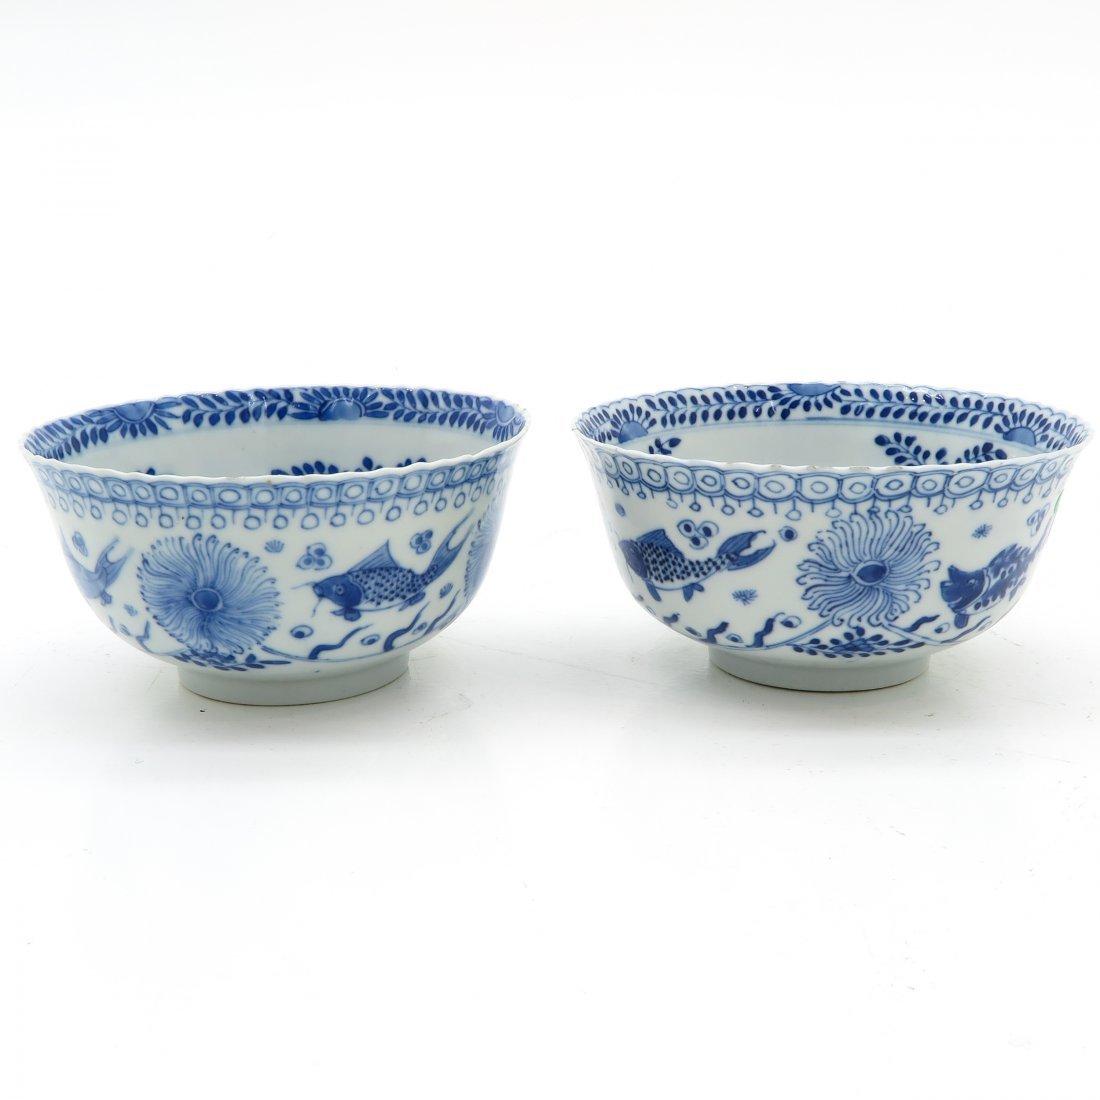 Lot of 2 China Porcelain Bowls